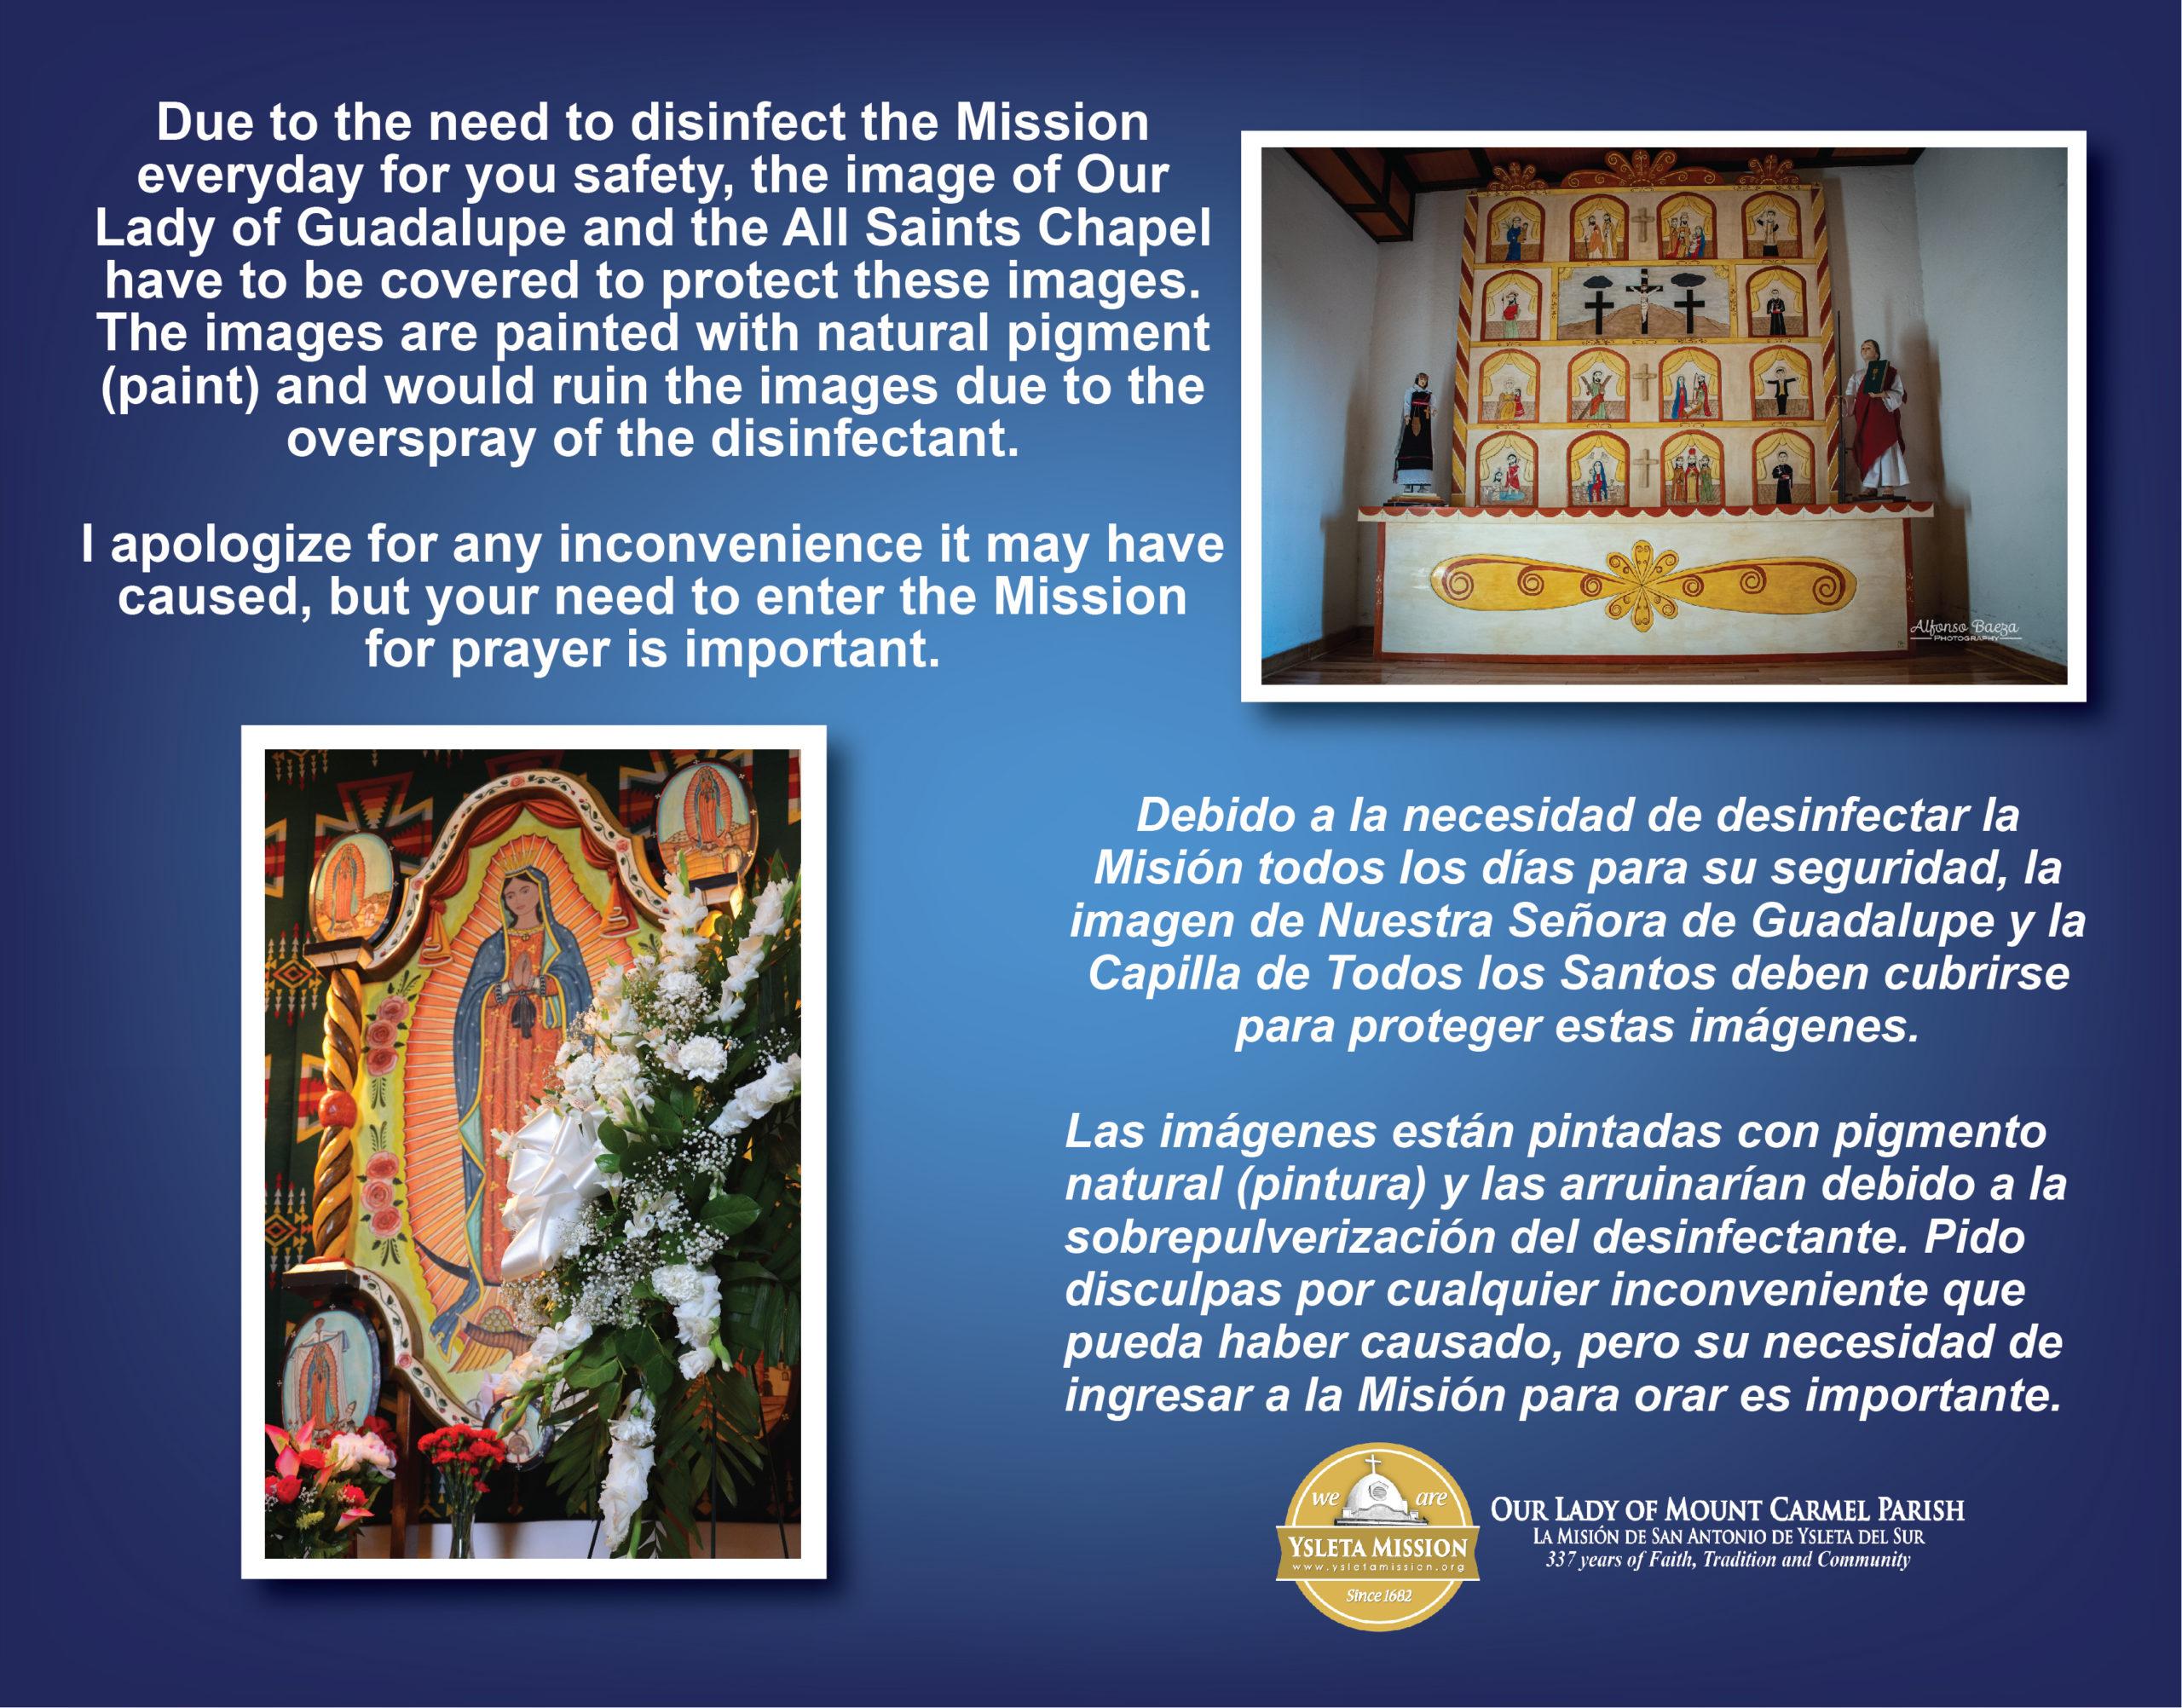 Phase1 opening retablos